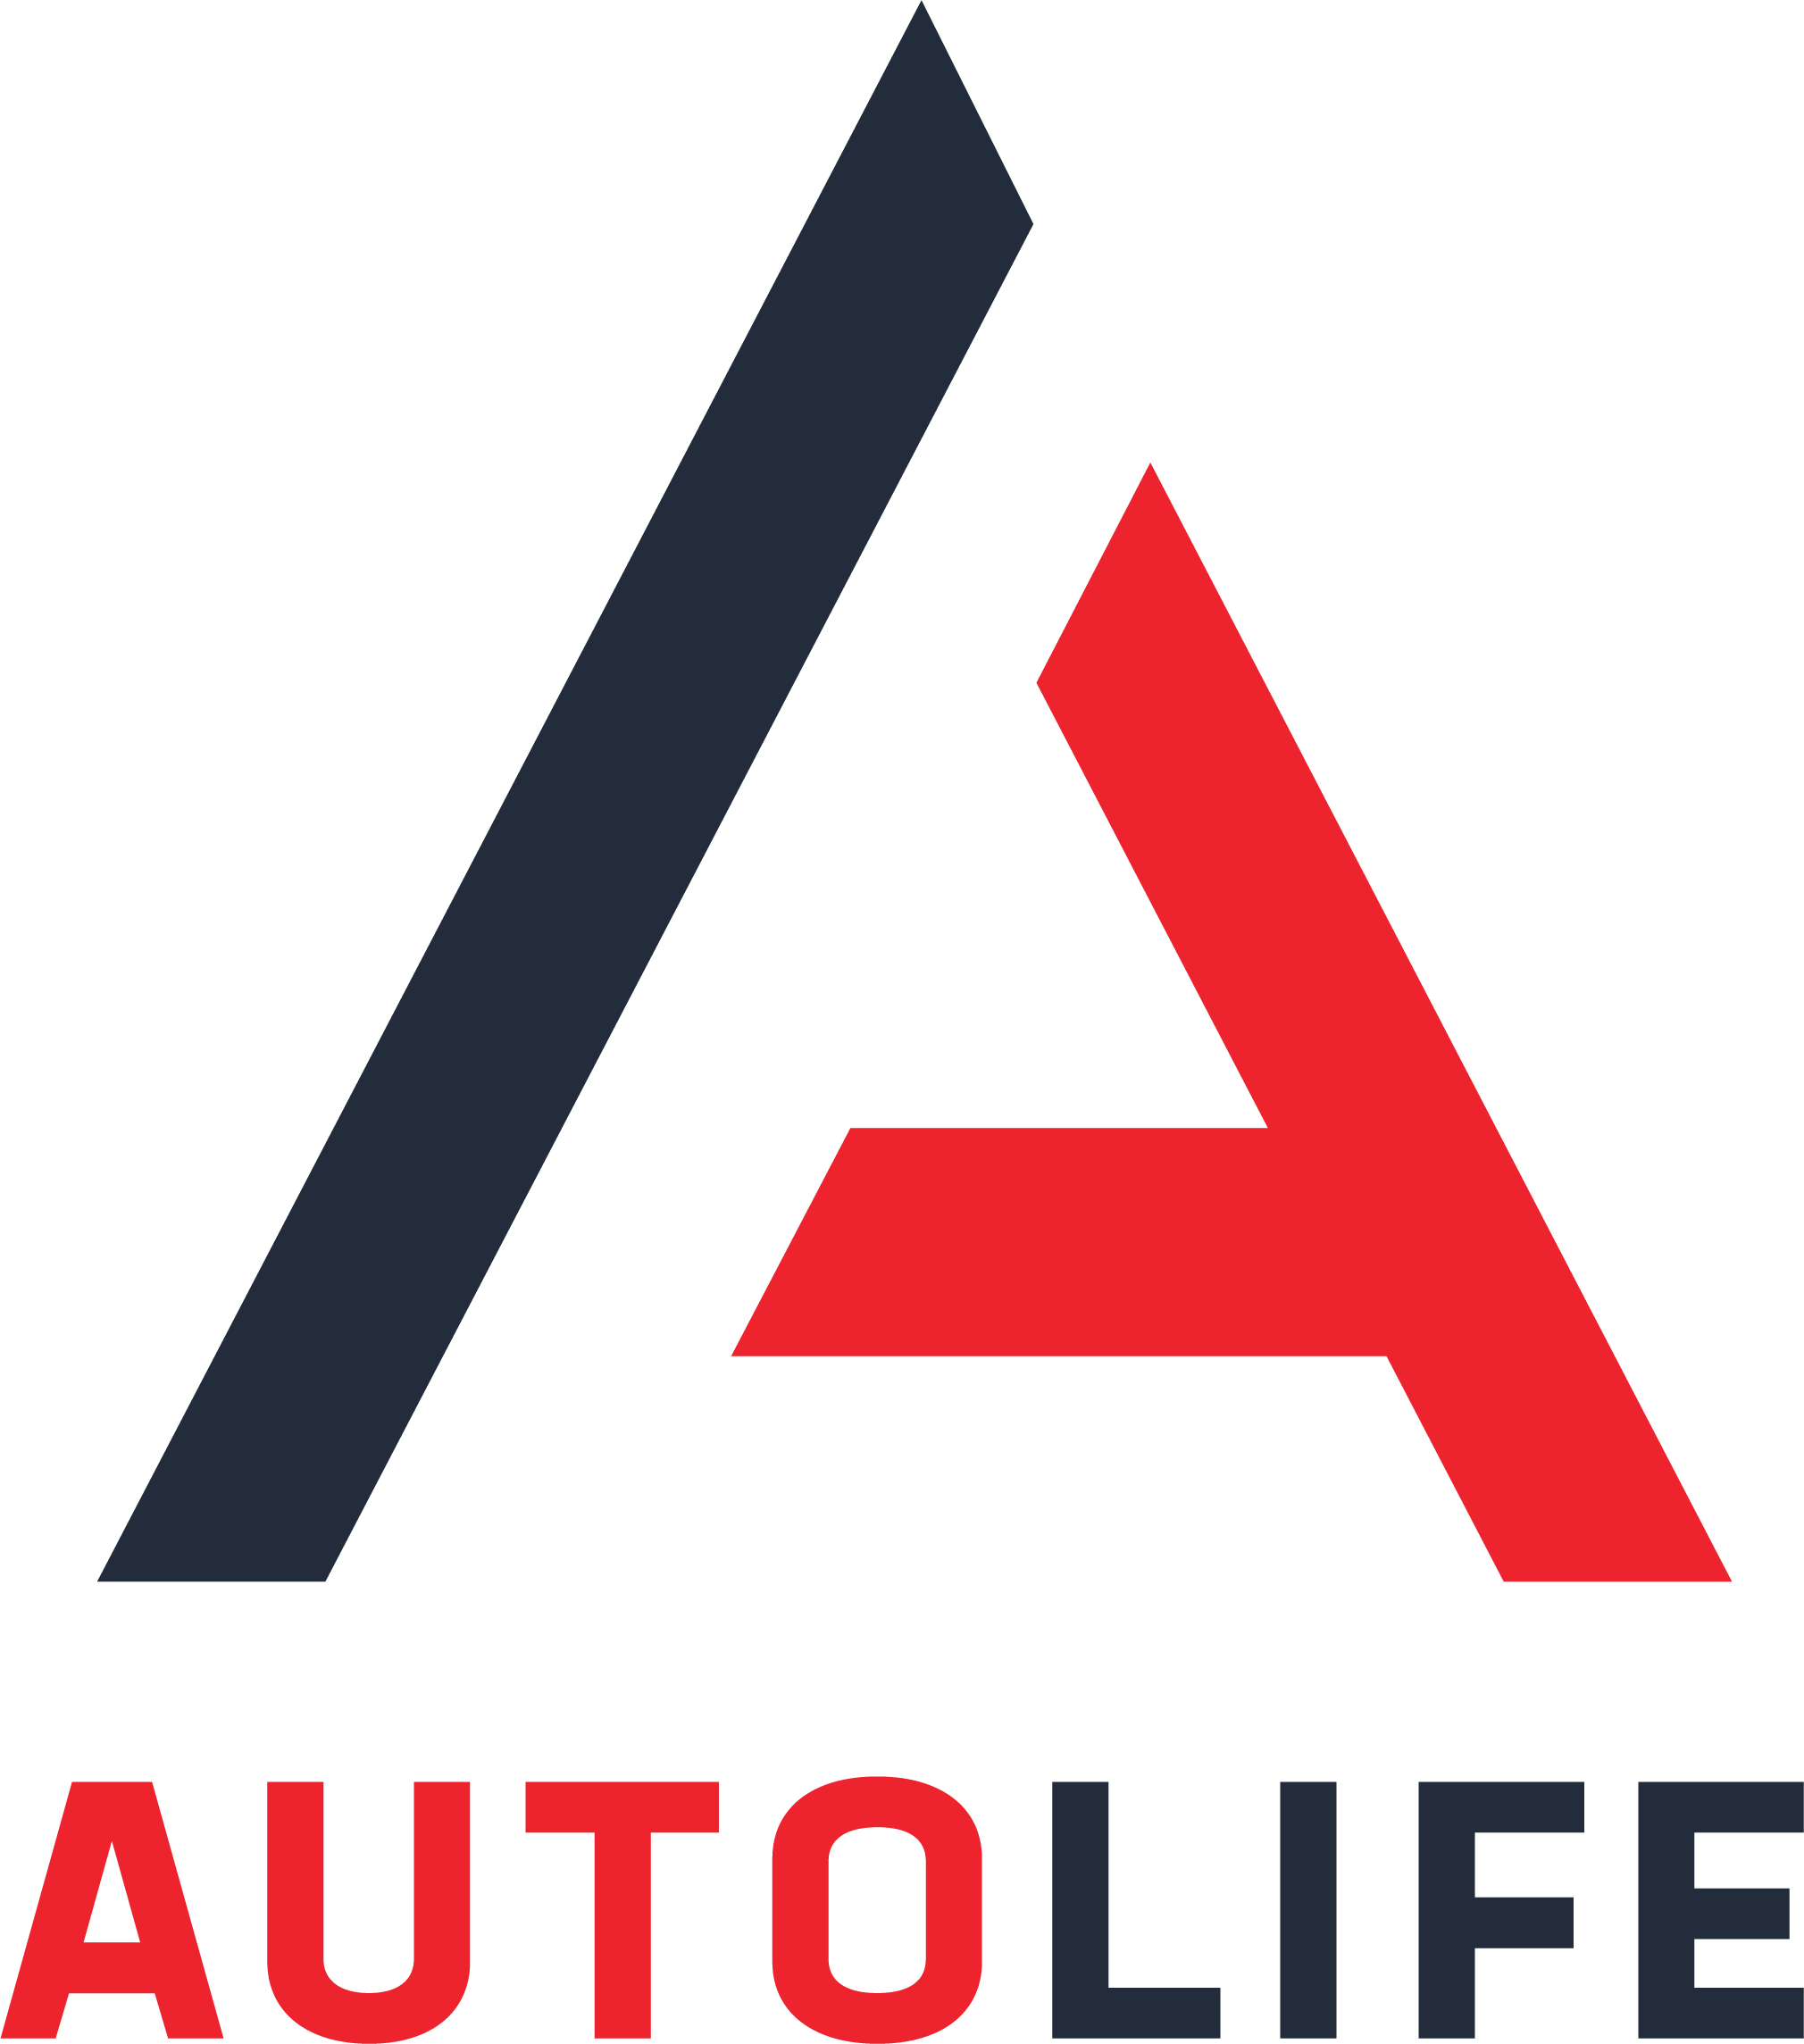 autolife logo.png